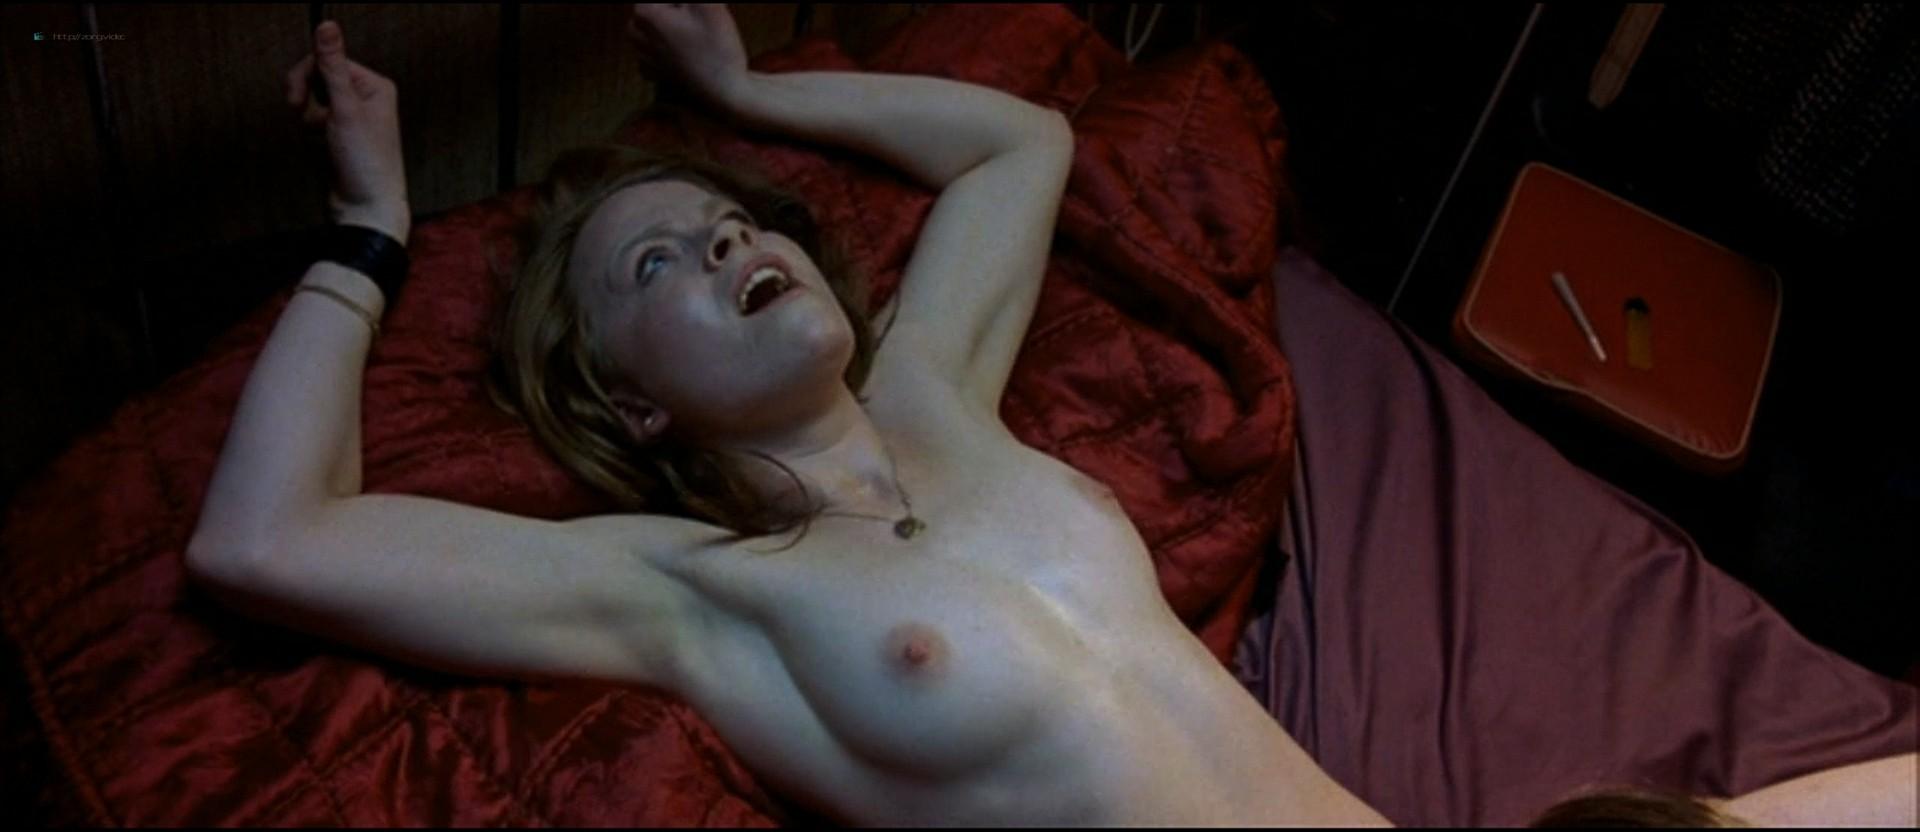 Signe Egholm Olsen nude hot sex Pernille Vallentin nude sex too - Nordkraft (DK-2005) HD 1080p Web (10)